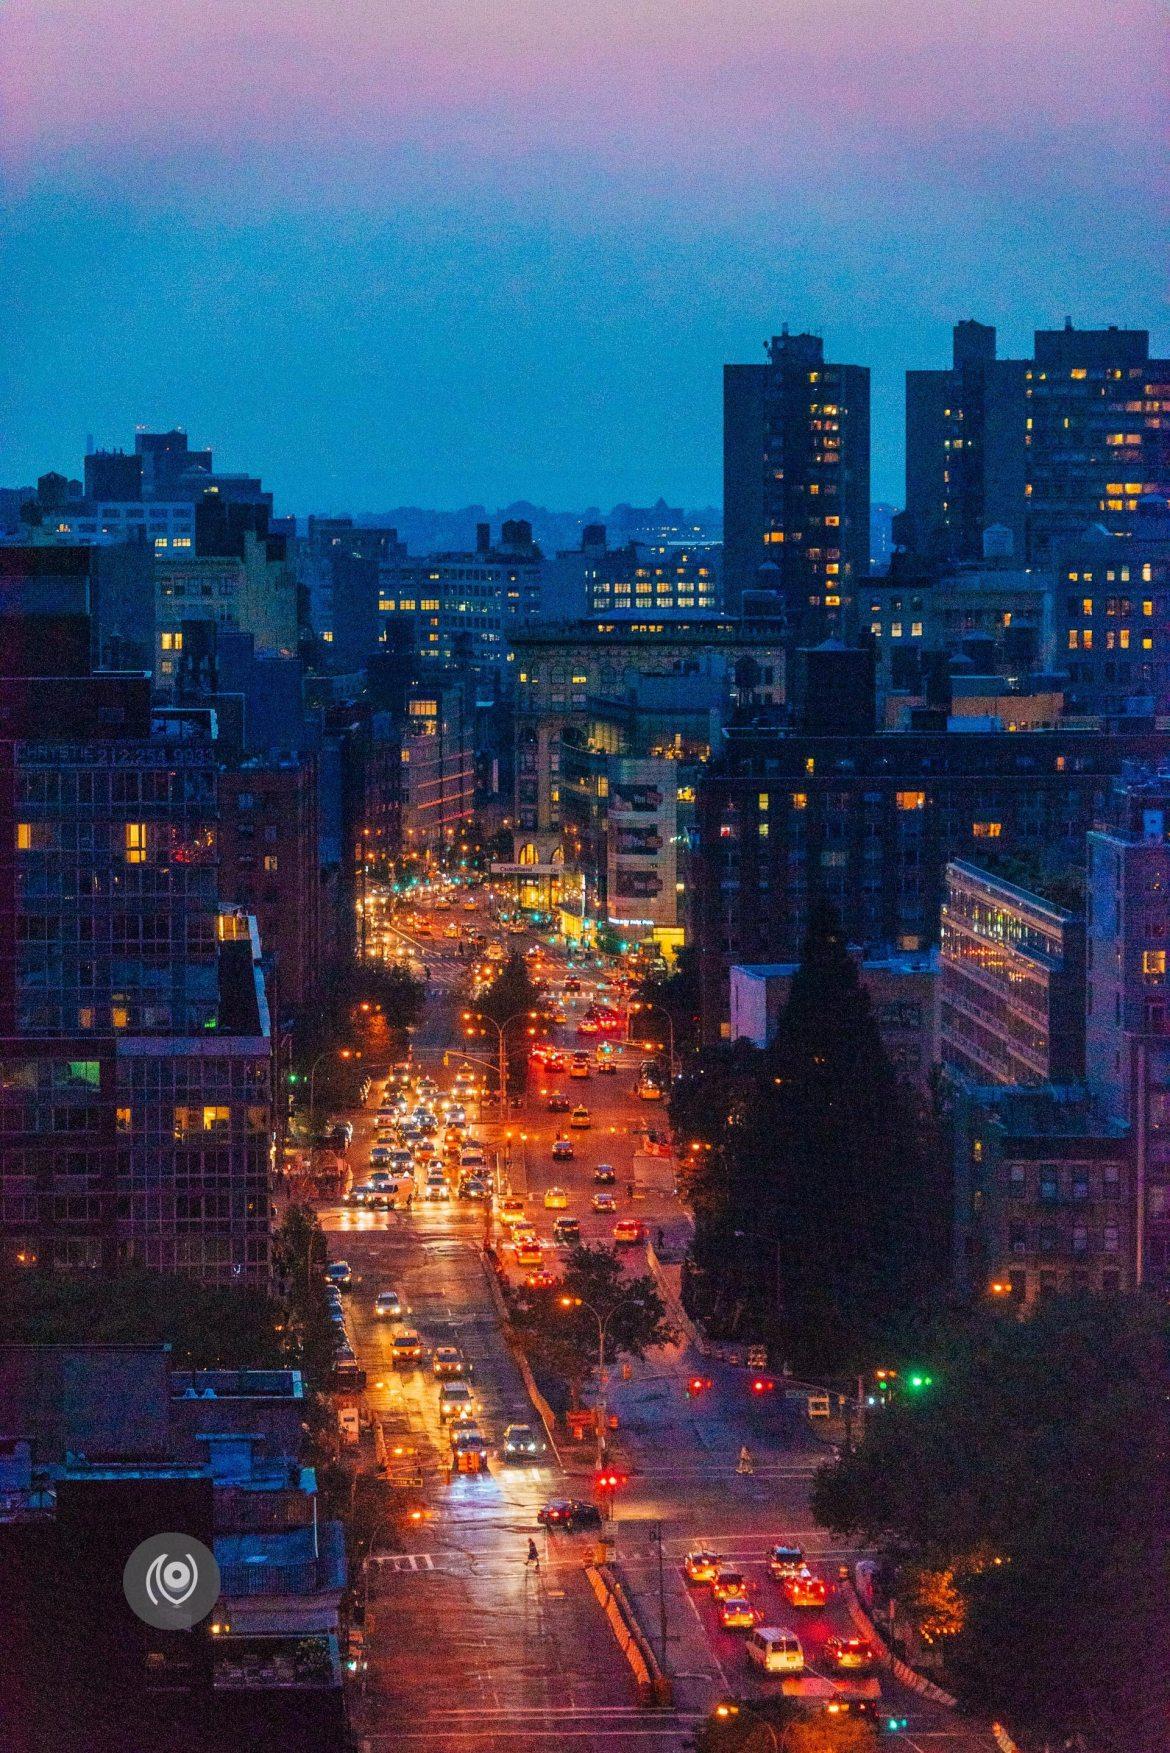 Apartment View #EyesForNewYork #REDHUxNYC #REDHUxAIRBNB Naina.co Luxury & Lifestyle, Photographer Storyteller, Blogger